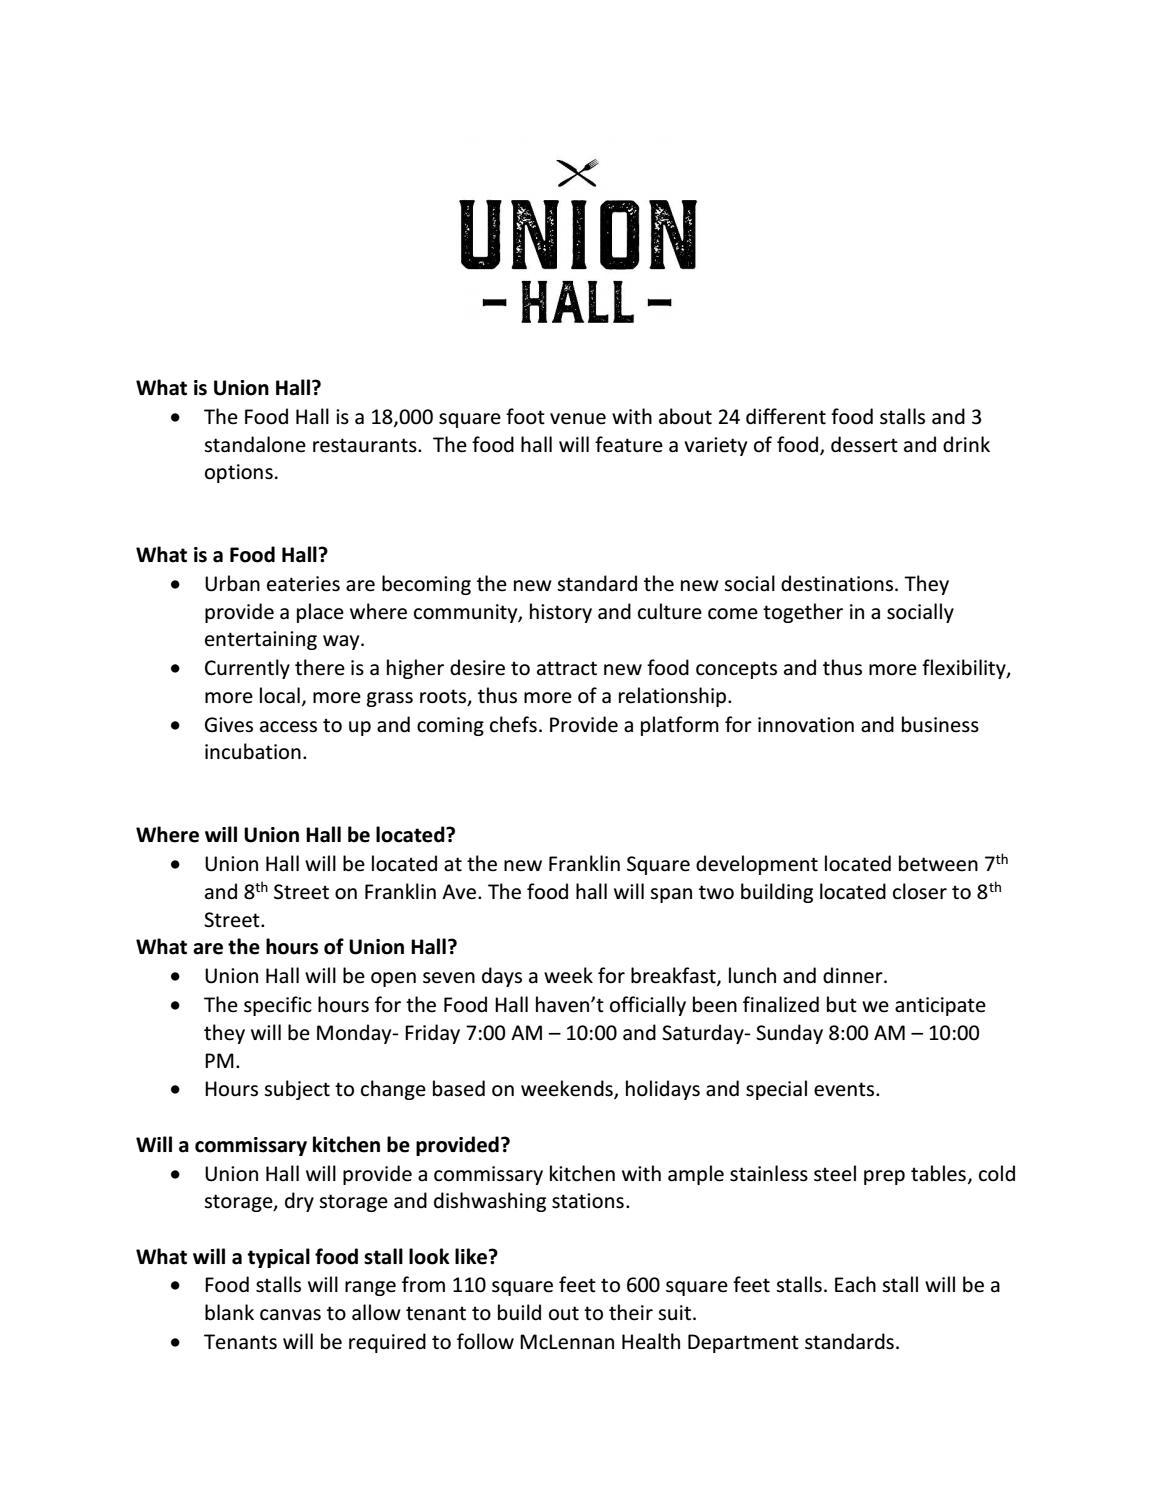 Union hall faq by hannabbraud - issuu